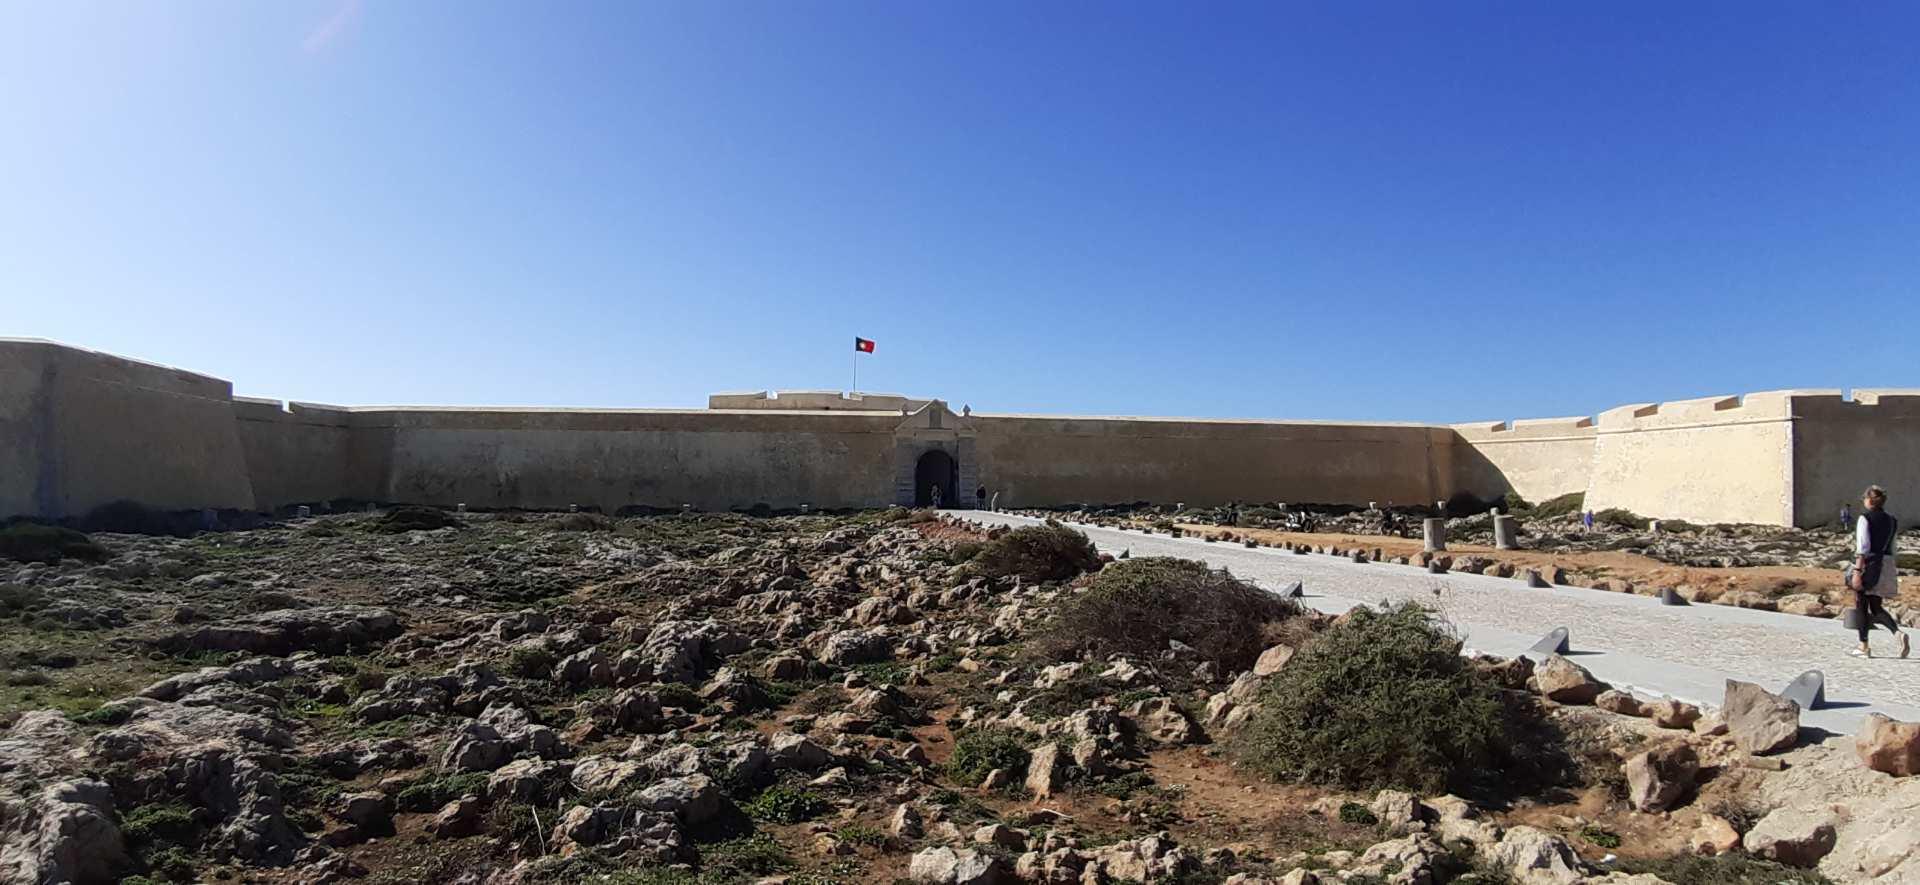 Fortaleza di Sagres